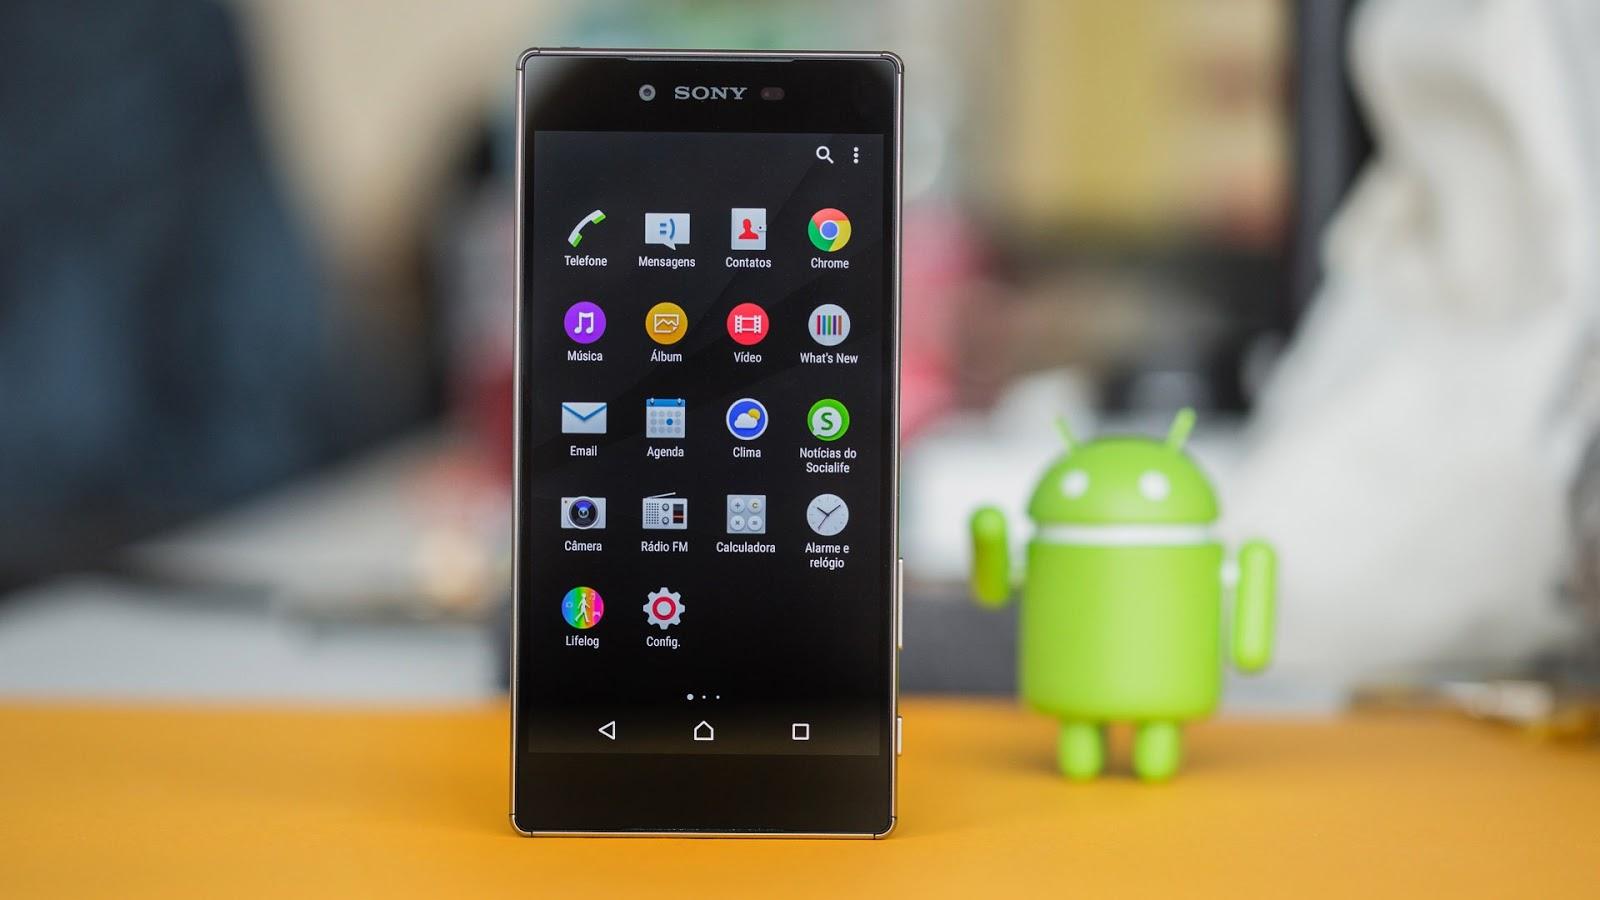 Androidpitxperiaz5premium7 How To Update Xperia Z5 Premium Dual